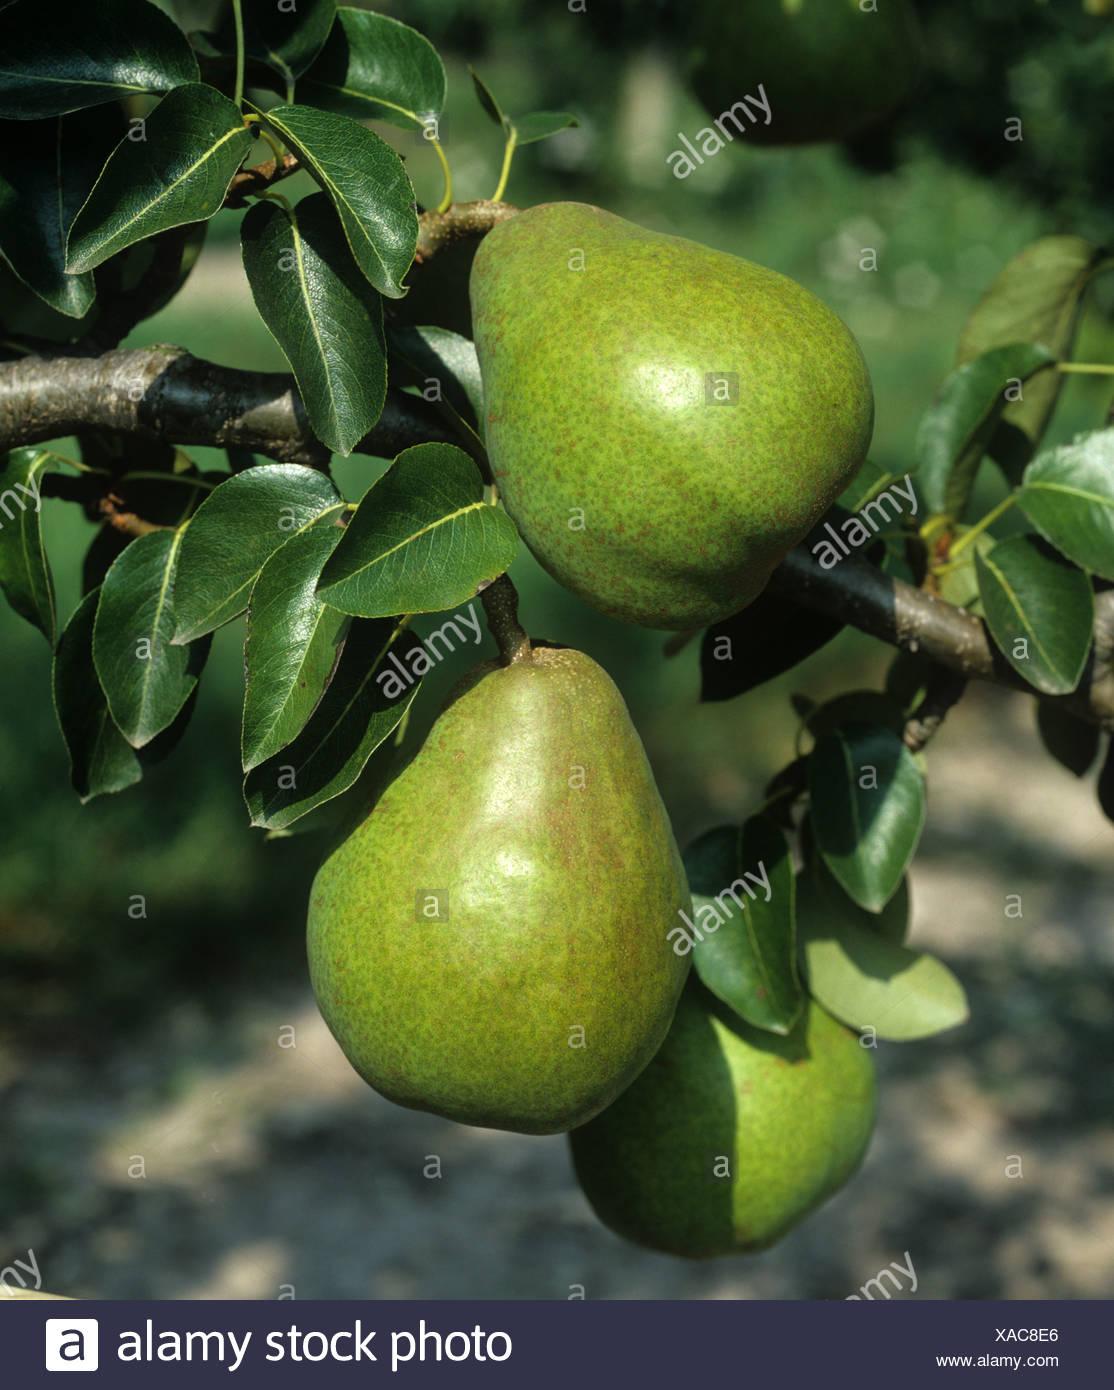 Mature Doyenne du Comice pear fruit on the tree, Oxfordshire - Stock Image